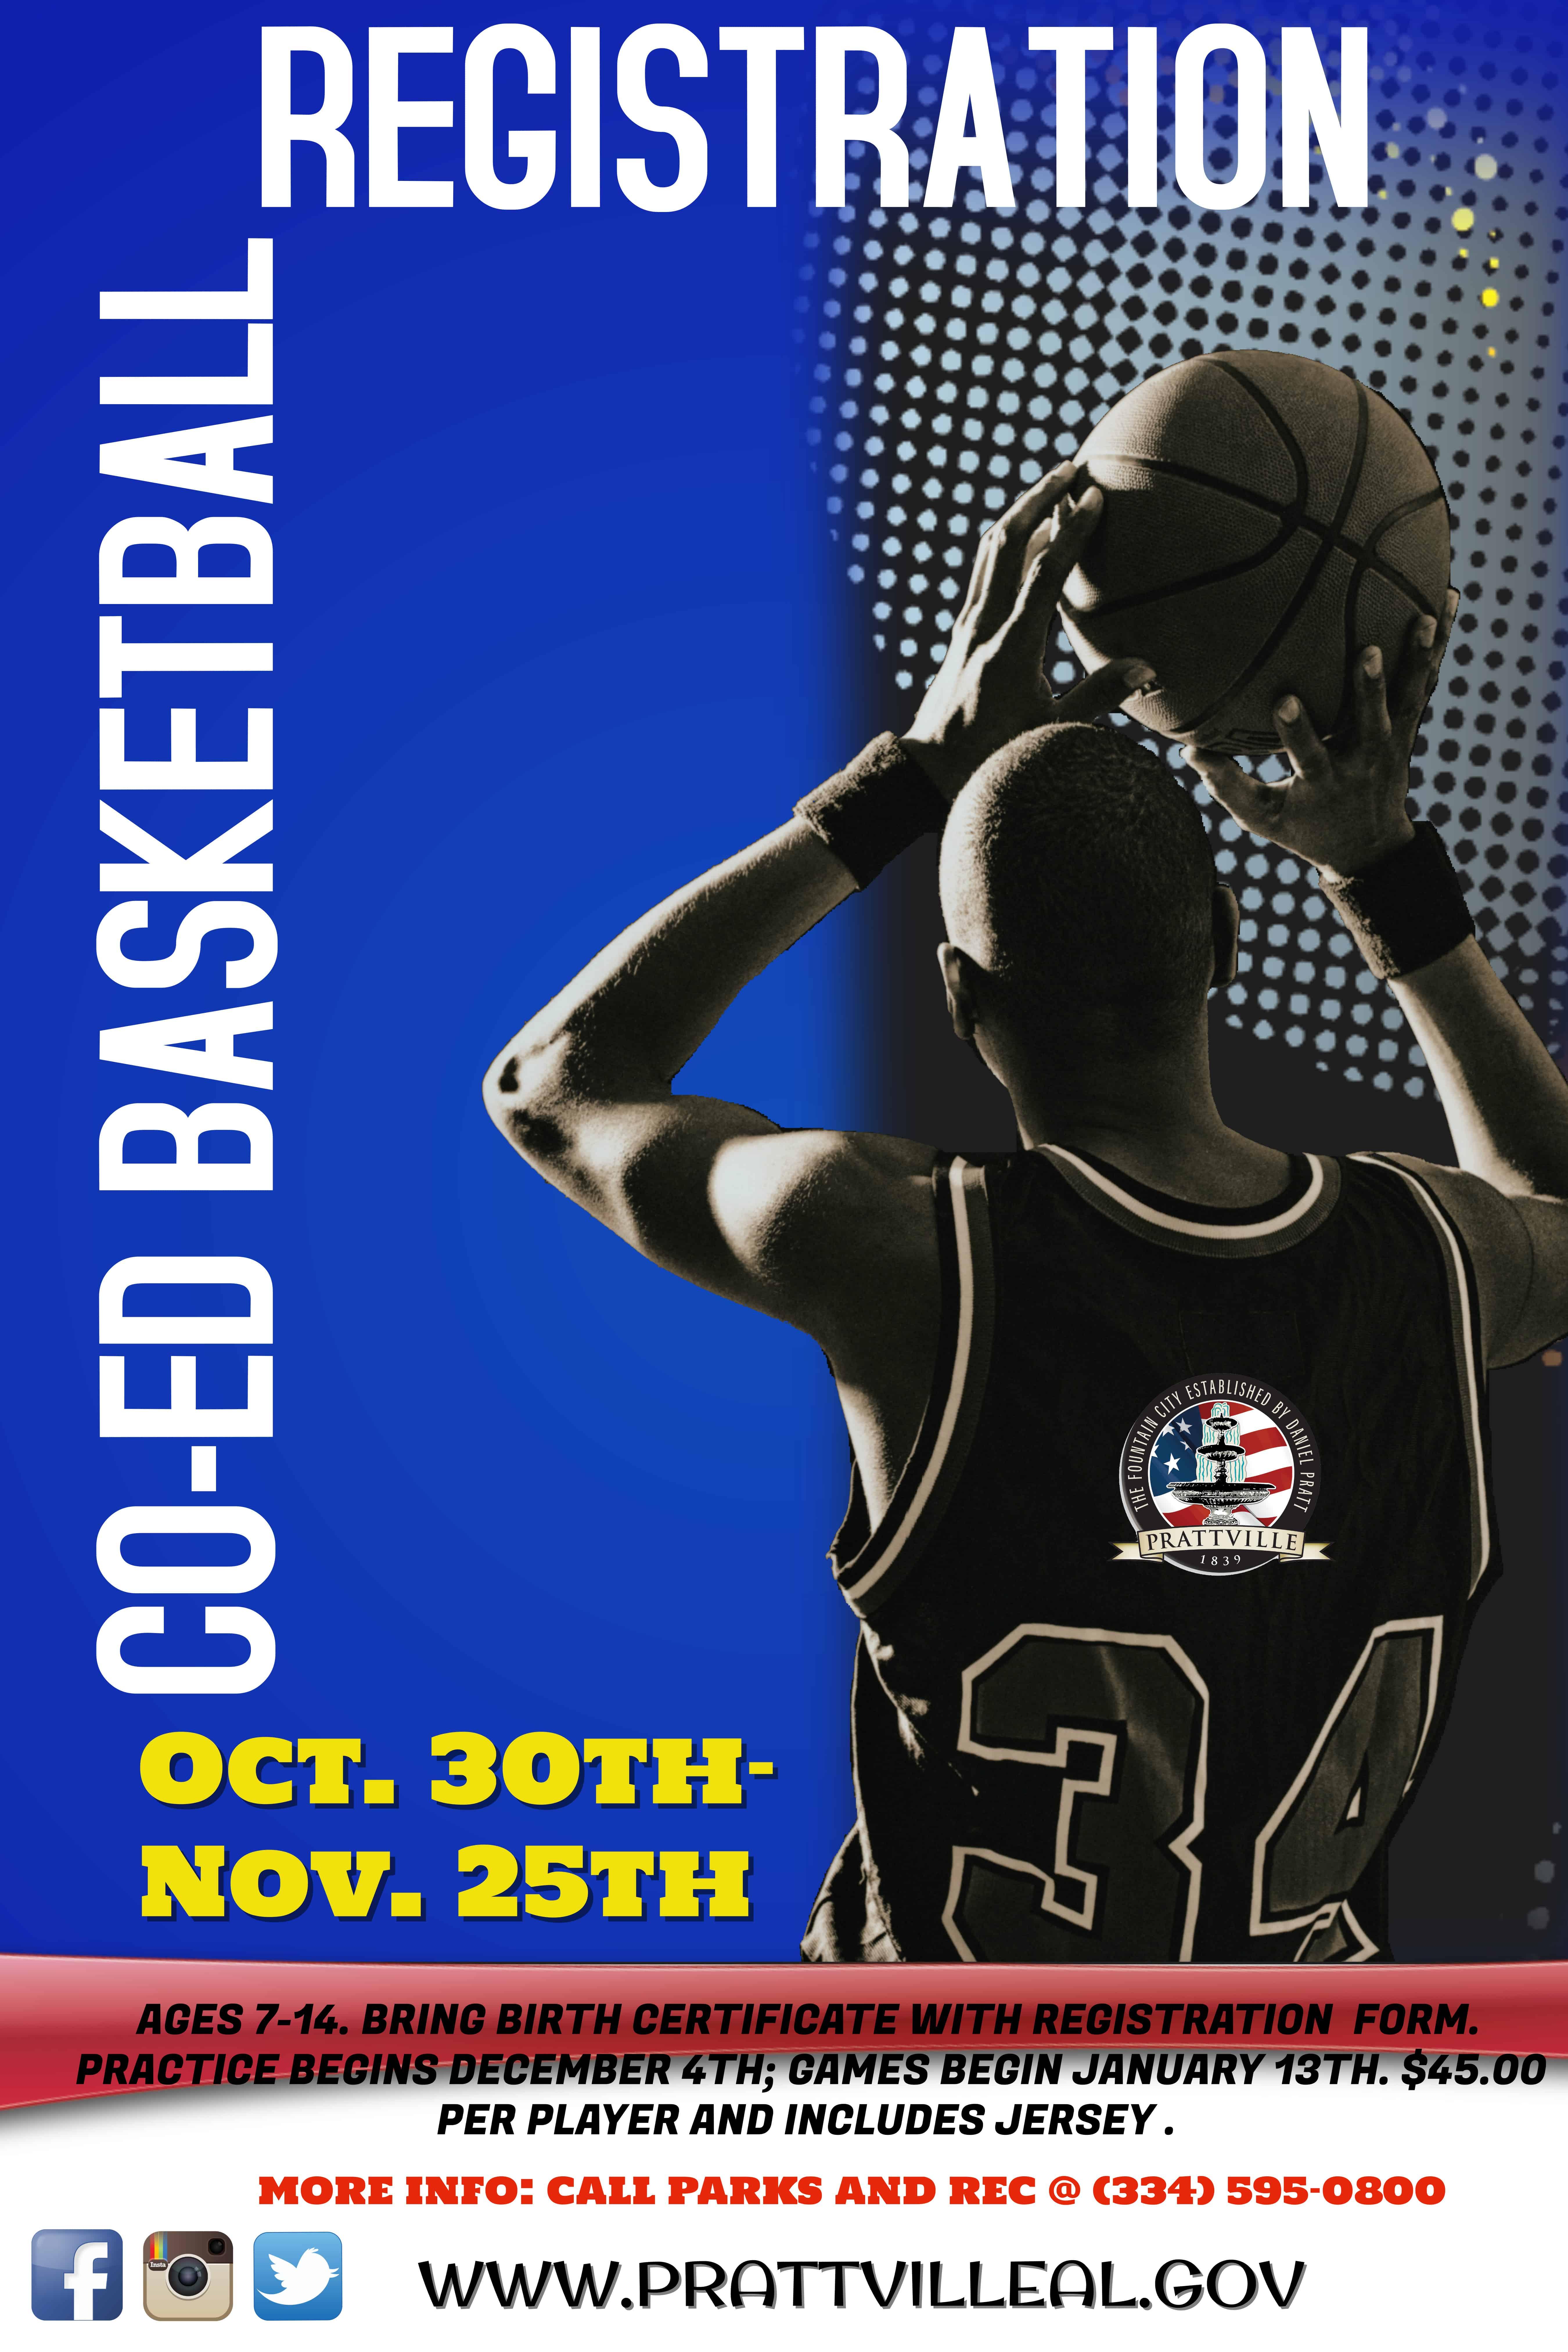 YOUTH COED BASKETBALL   Parks & Recreation : Prattville, Alabama - PrattvilleAL.gov - Official ...